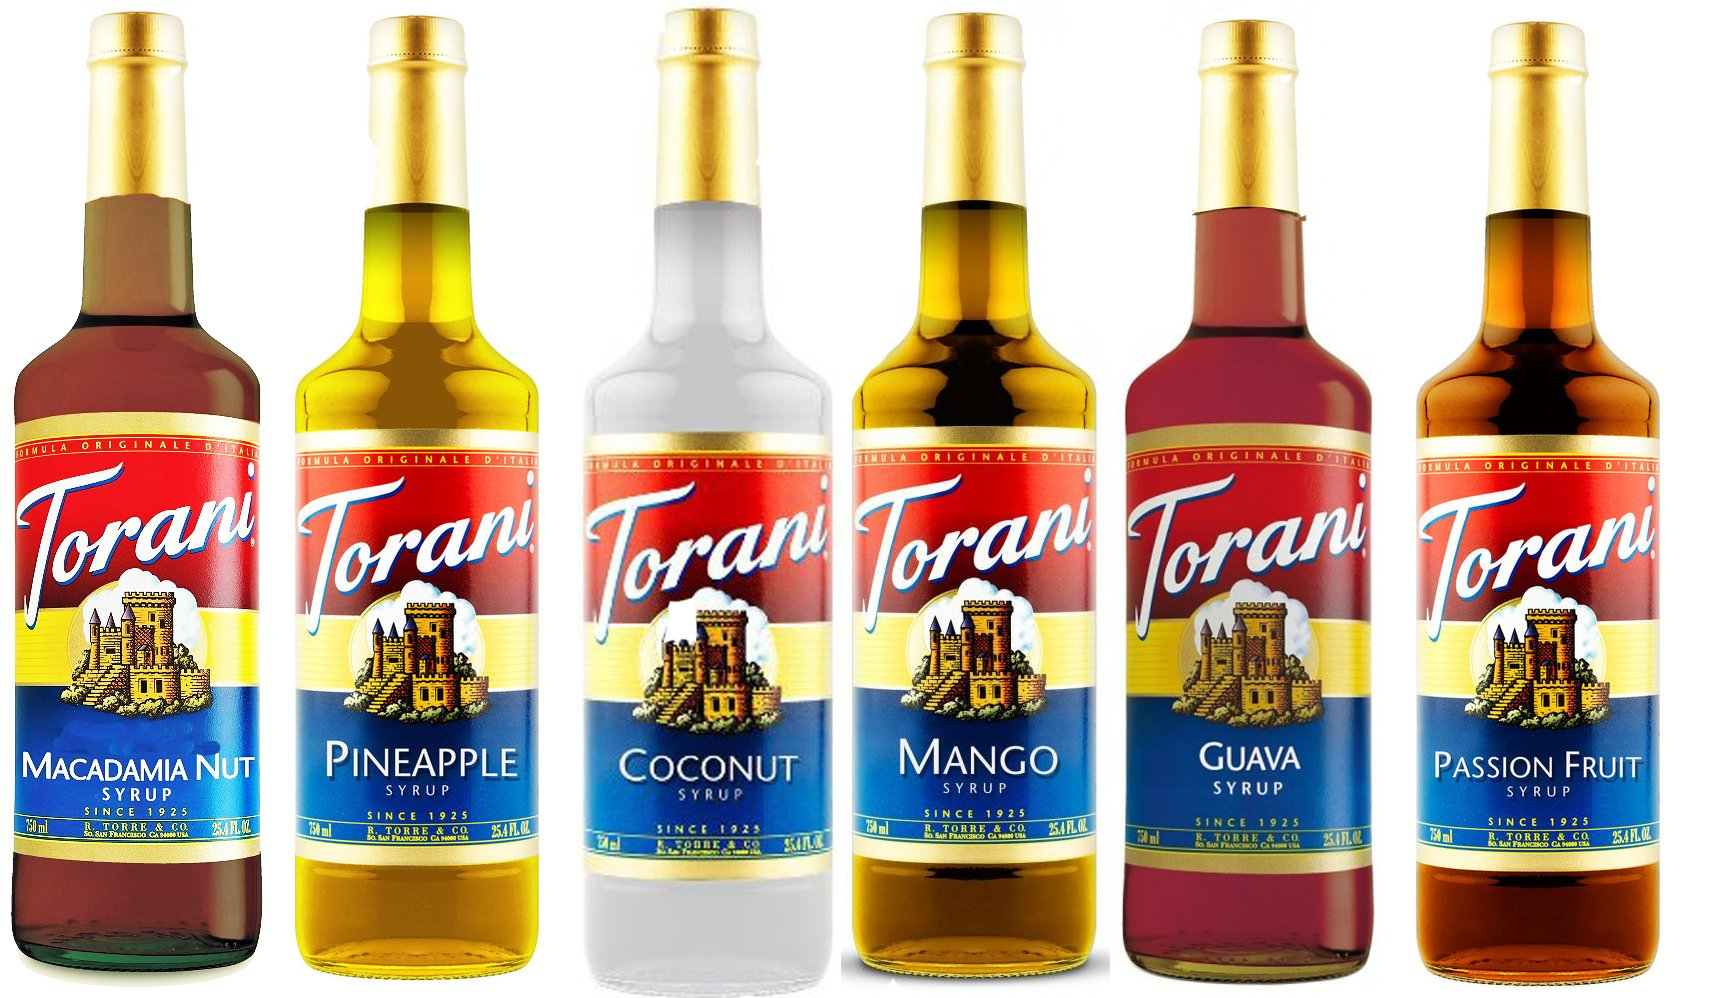 Torani Hawaiian Syrup Variety Pack of 6 - Macadamia Nut, Pineapple, Coconut, Mango, Guava & Passion Fruit (750 ml ea bottle)